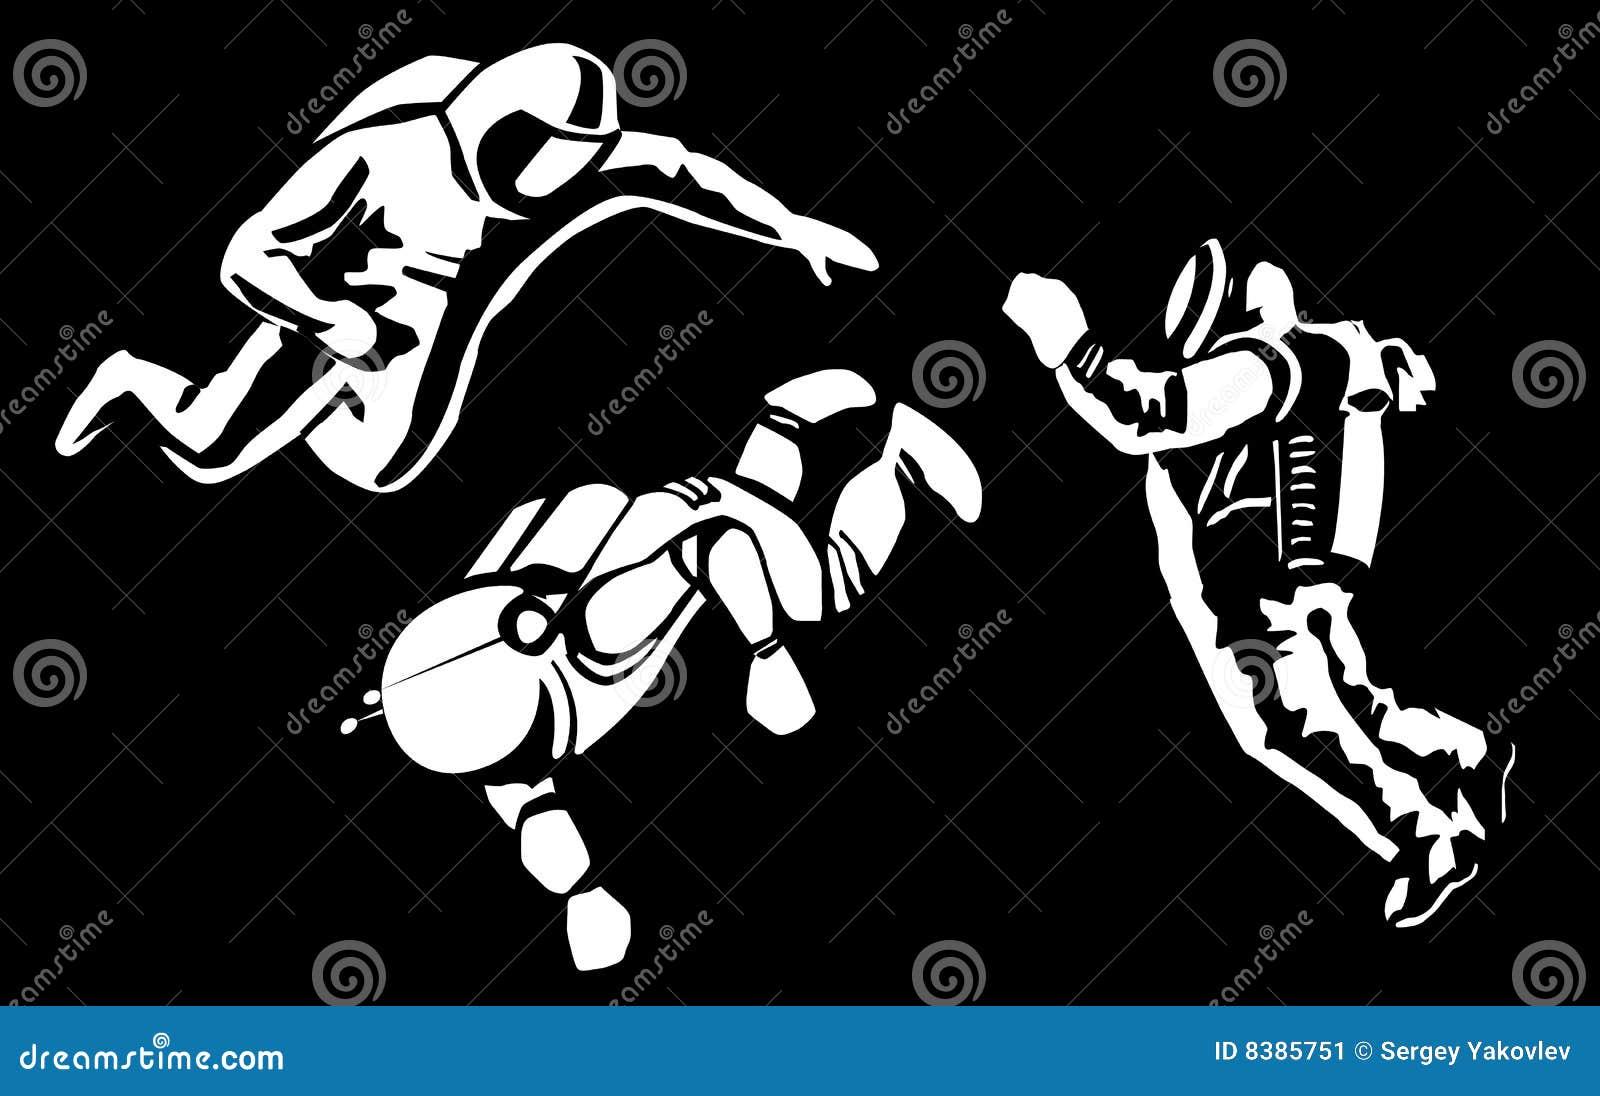 astronaut silhouette vector - photo #31